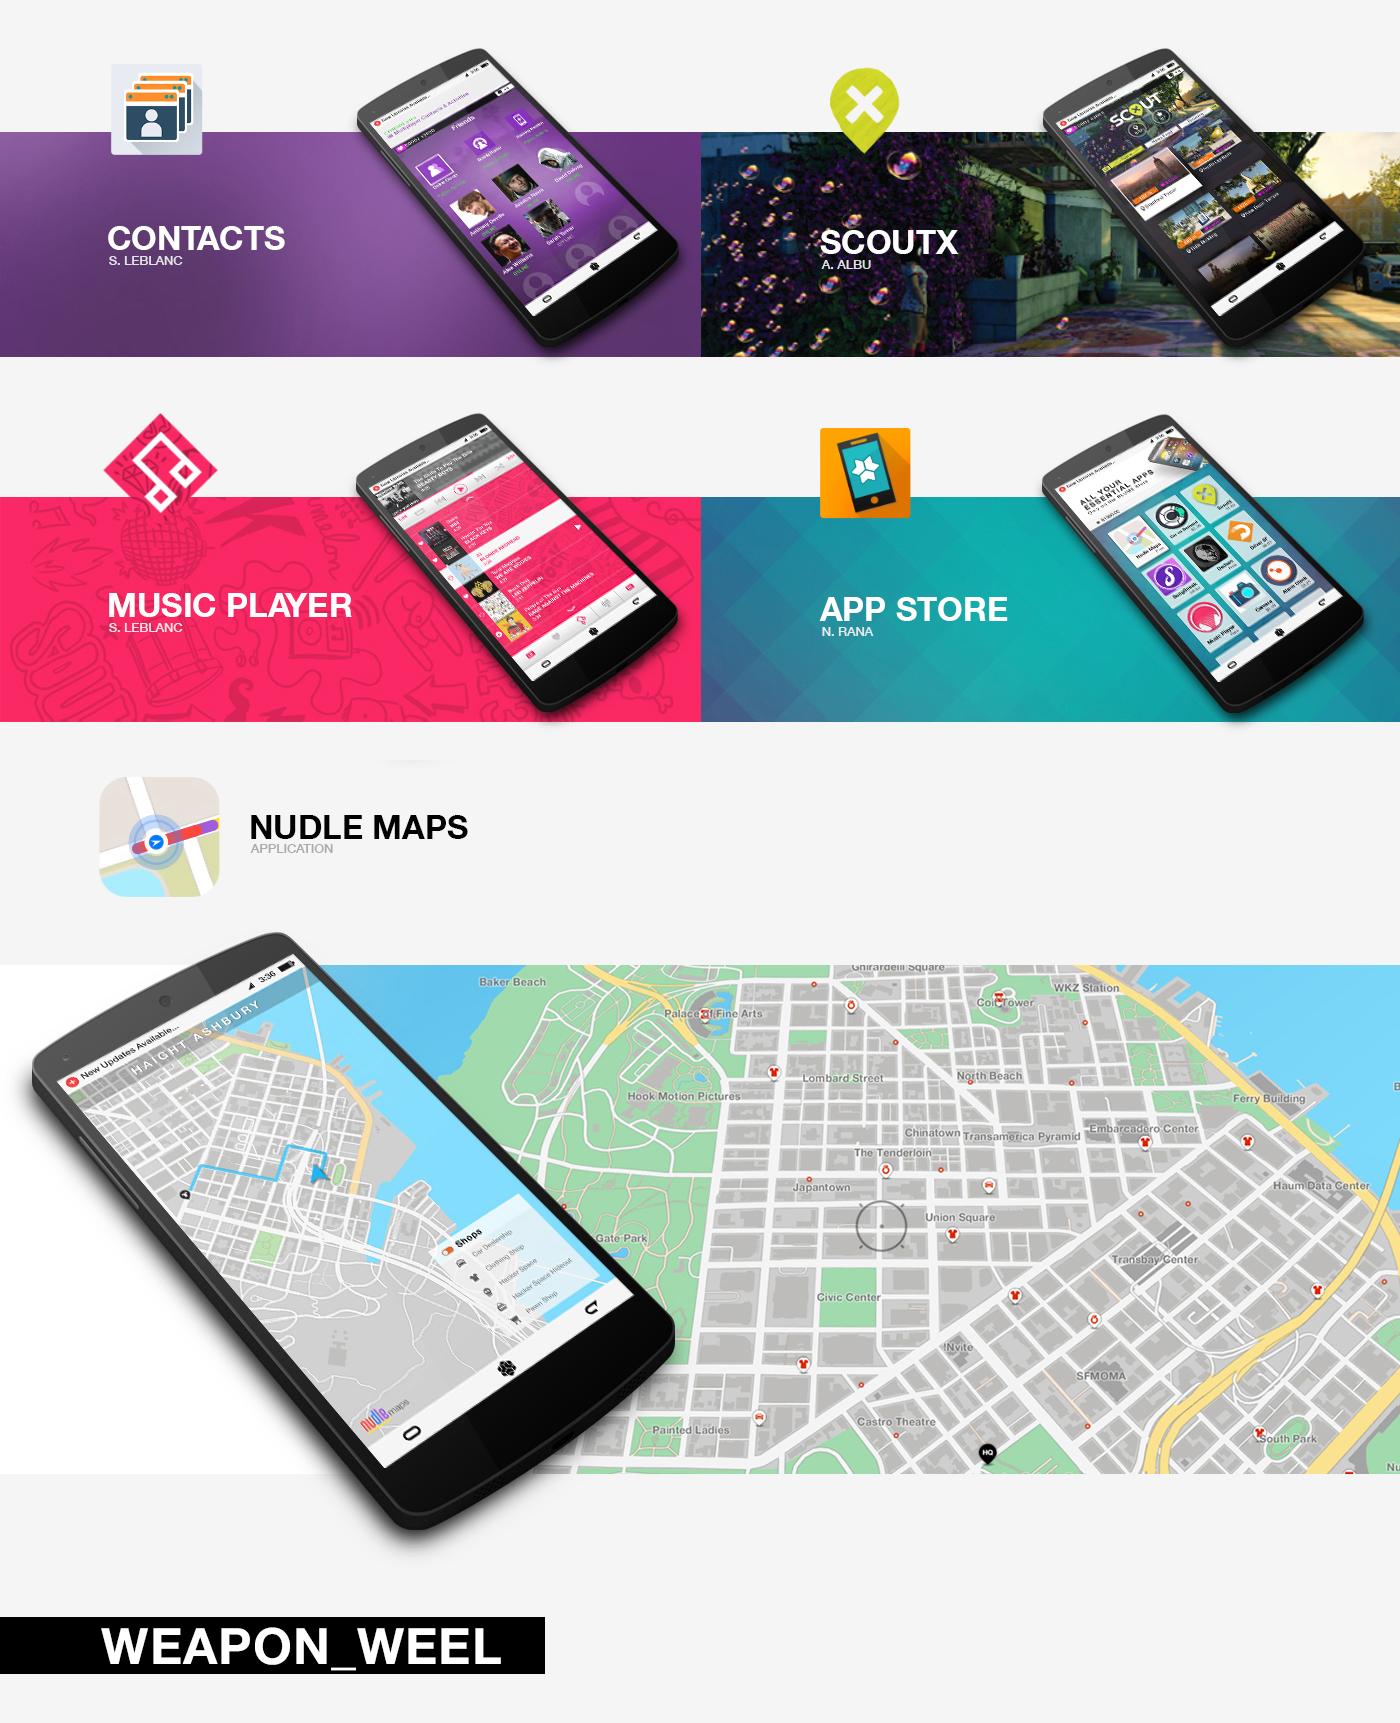 Watch Dogs 2 game UI design video game ux graphic design  art game design  ubisoft